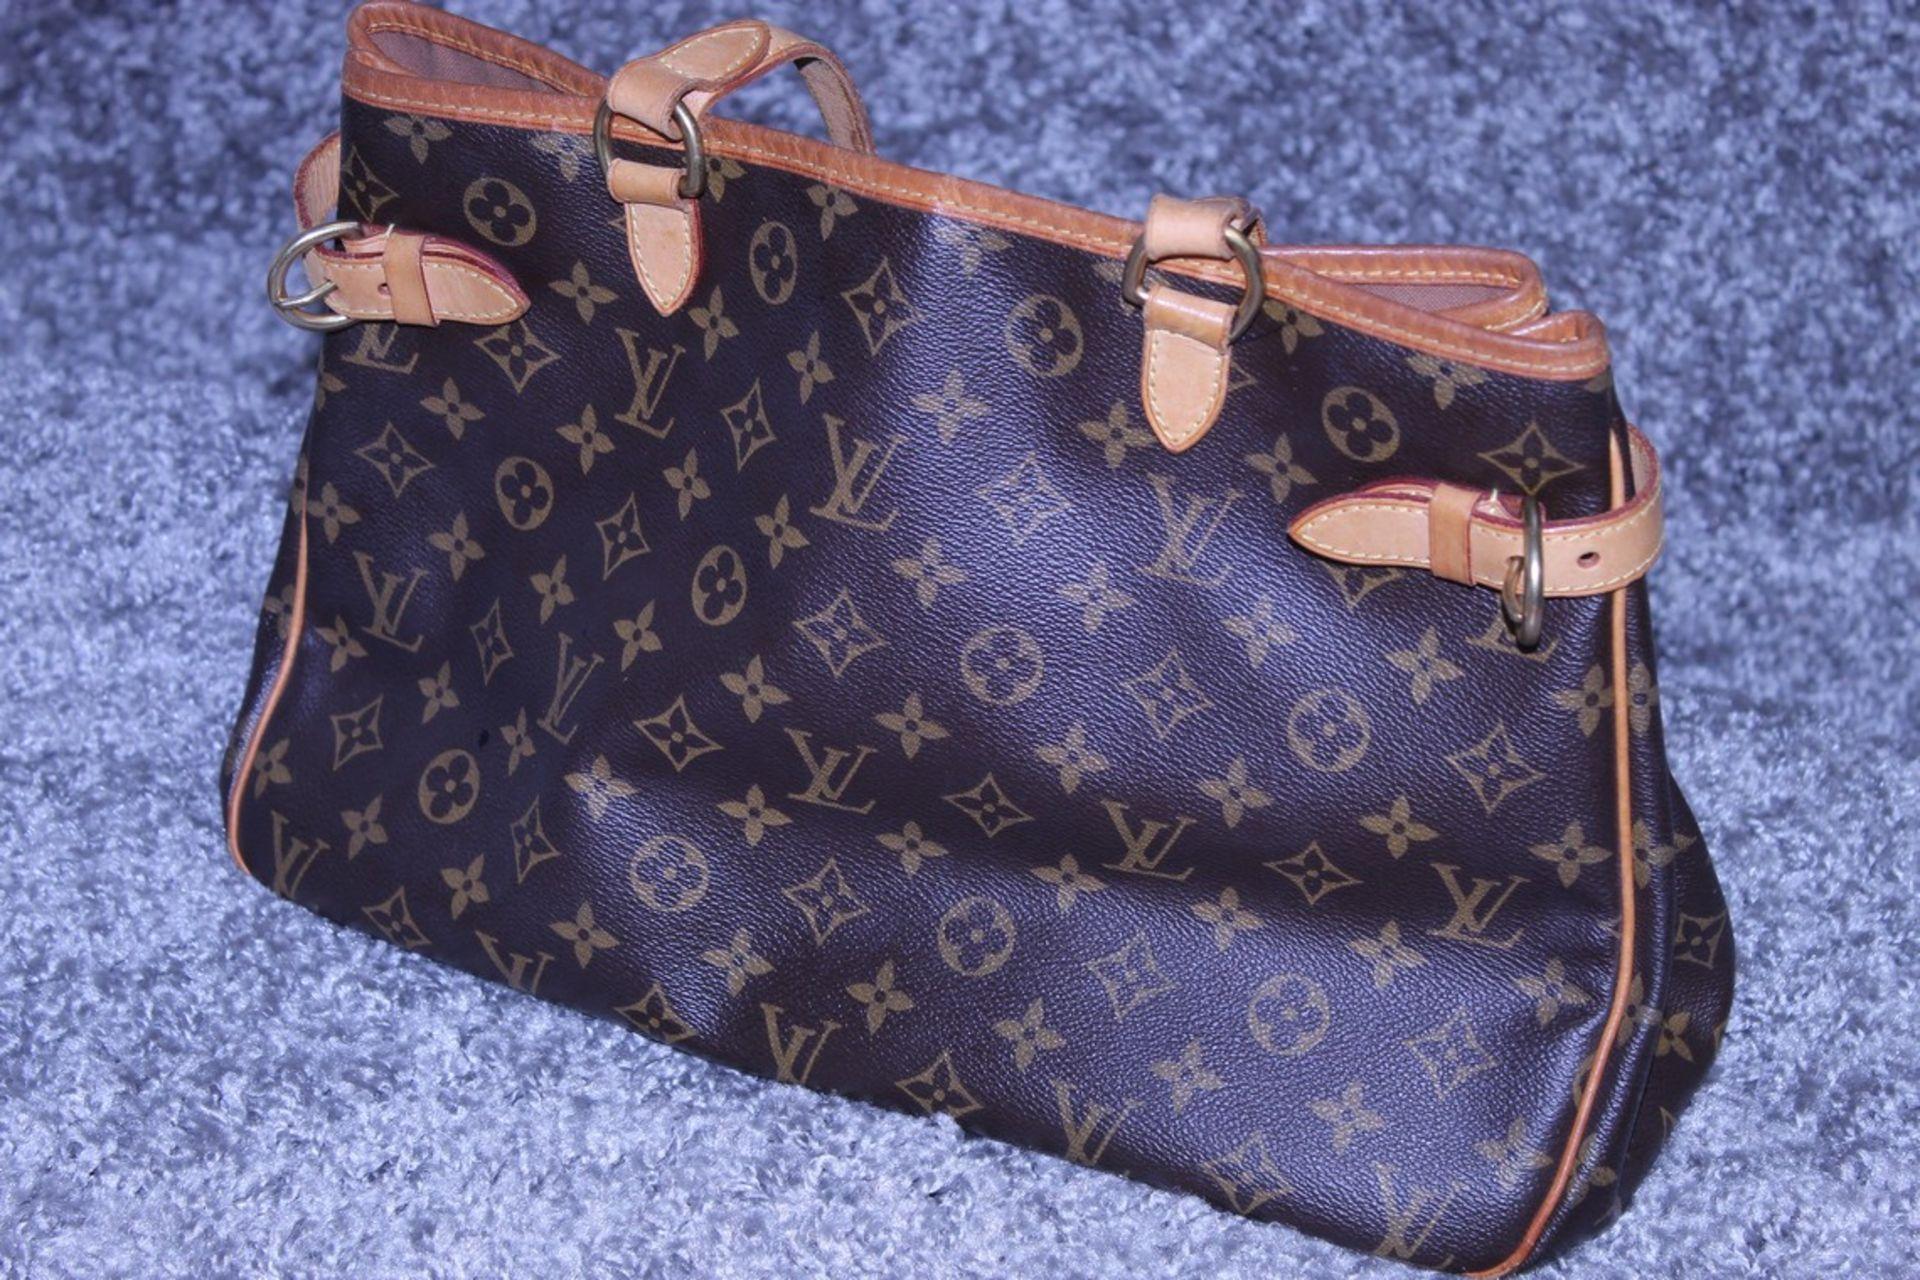 RRP £1,200 Louis Vuitton Batignolles Horizontal Shoulder Bag, Brown Monogram Canvas, Vachetta - Image 3 of 3